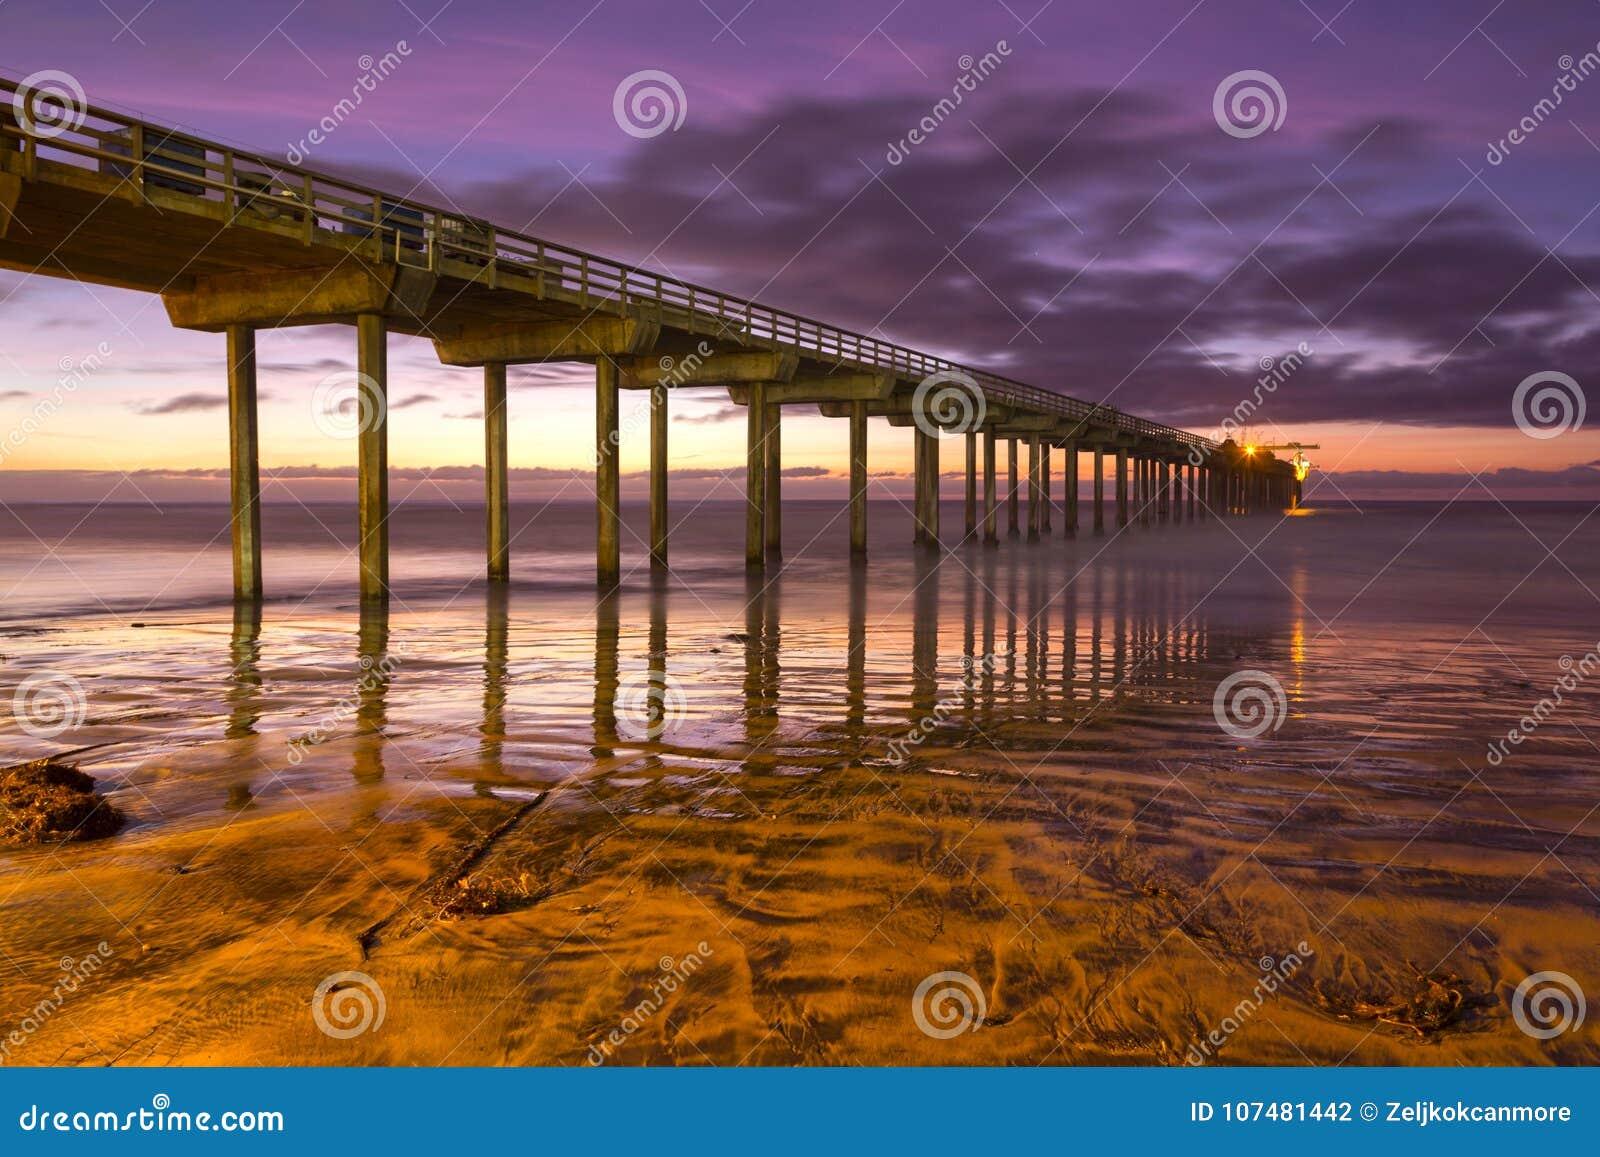 Praia San Diego California de Scripps Pier Sunset Colors La Jolla Shores